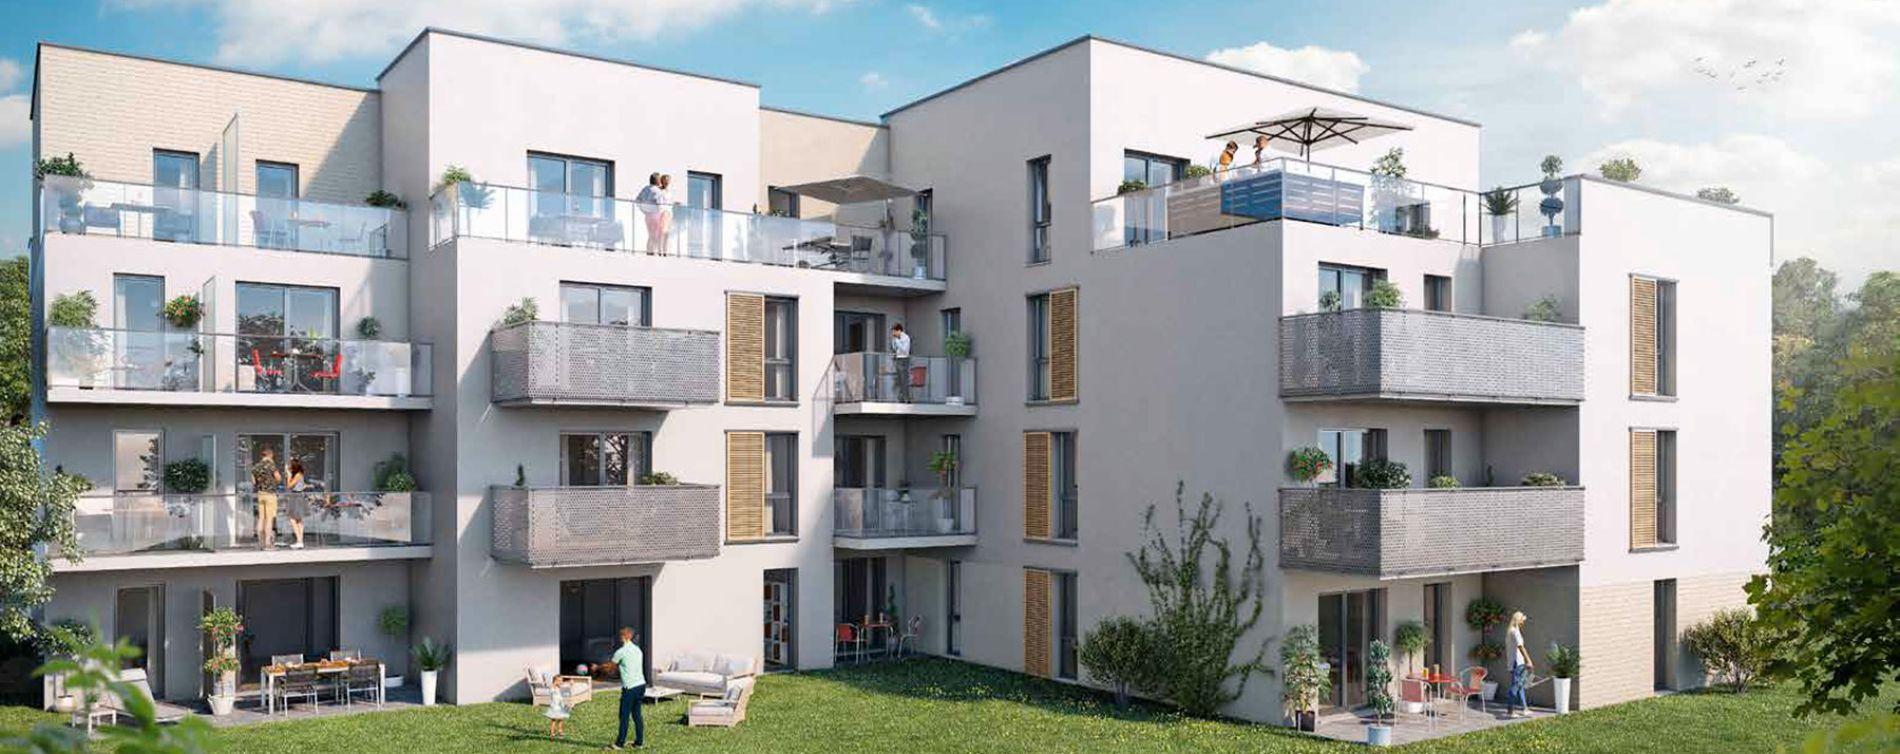 Résidence Villas Cédrat à Saint-Jean-de-Braye